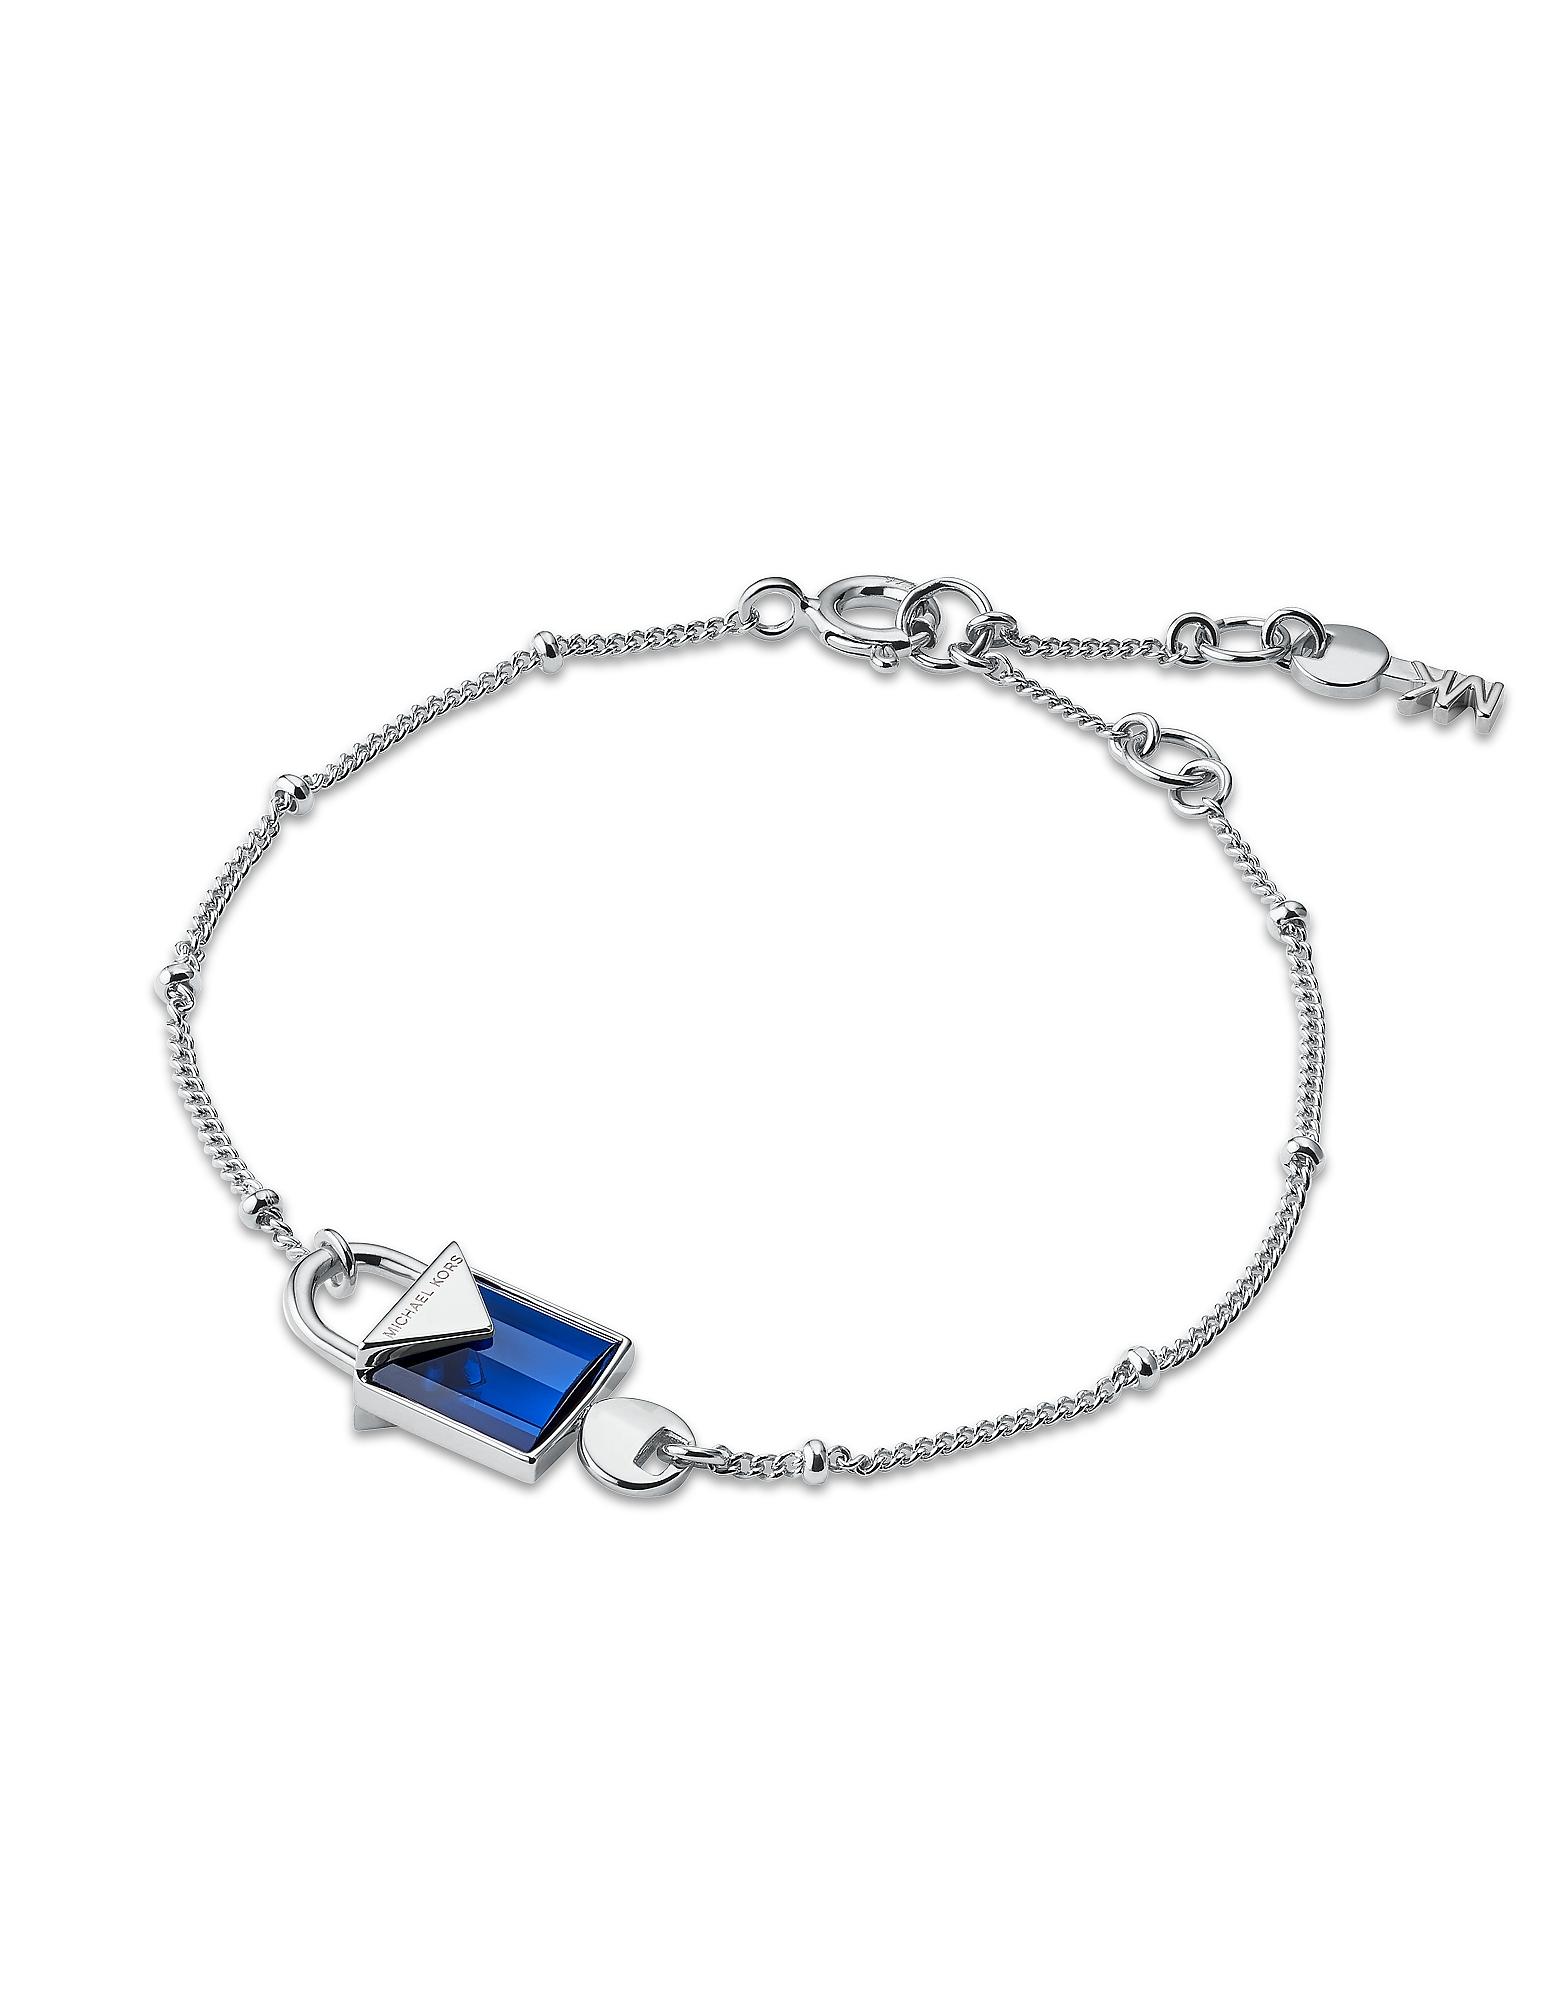 Mercer Sterling Silver Lock Bracelet Women's Bracelet